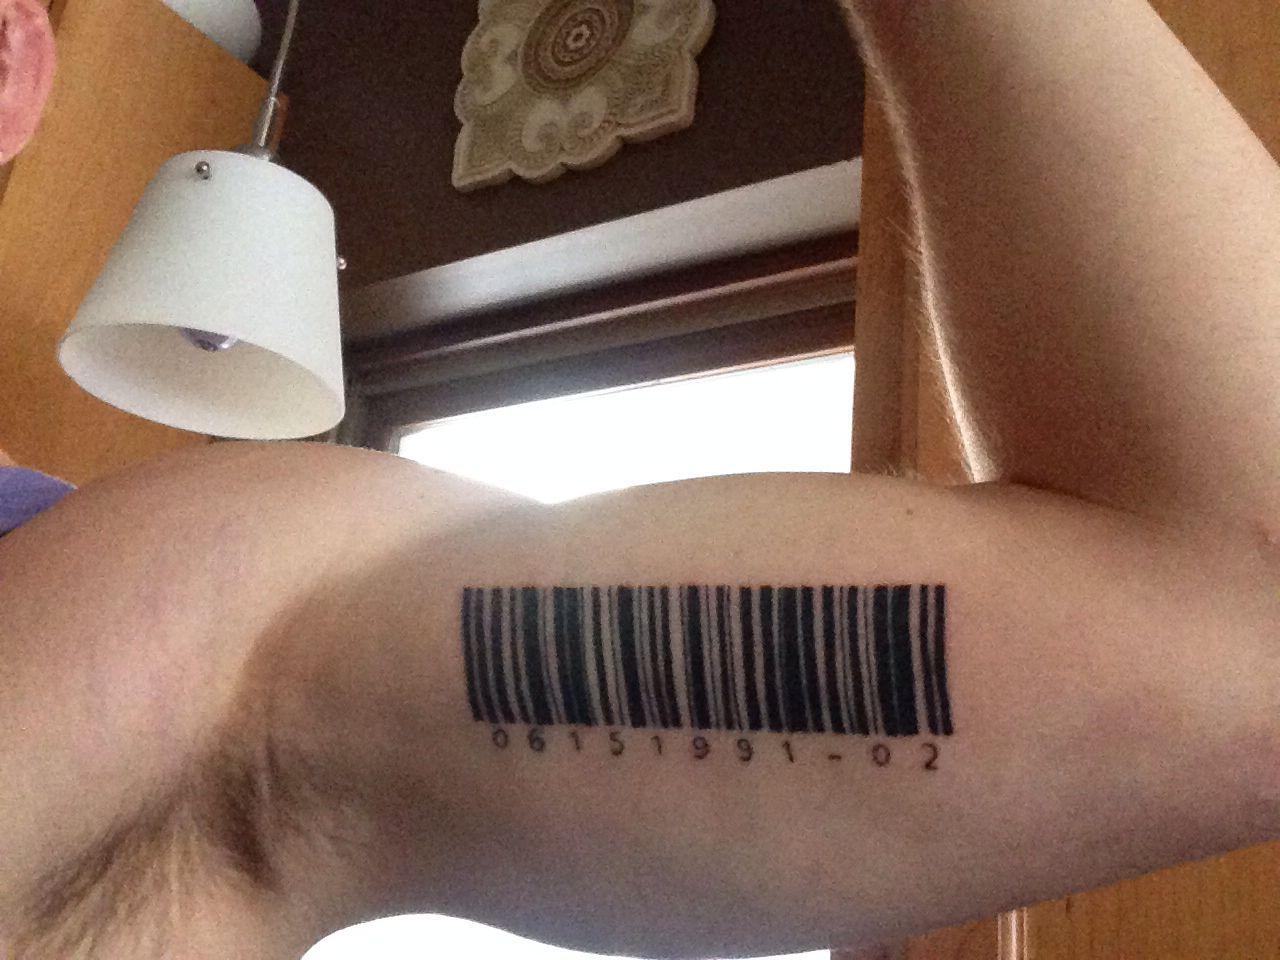 Tattoo liefhebbers dating uk